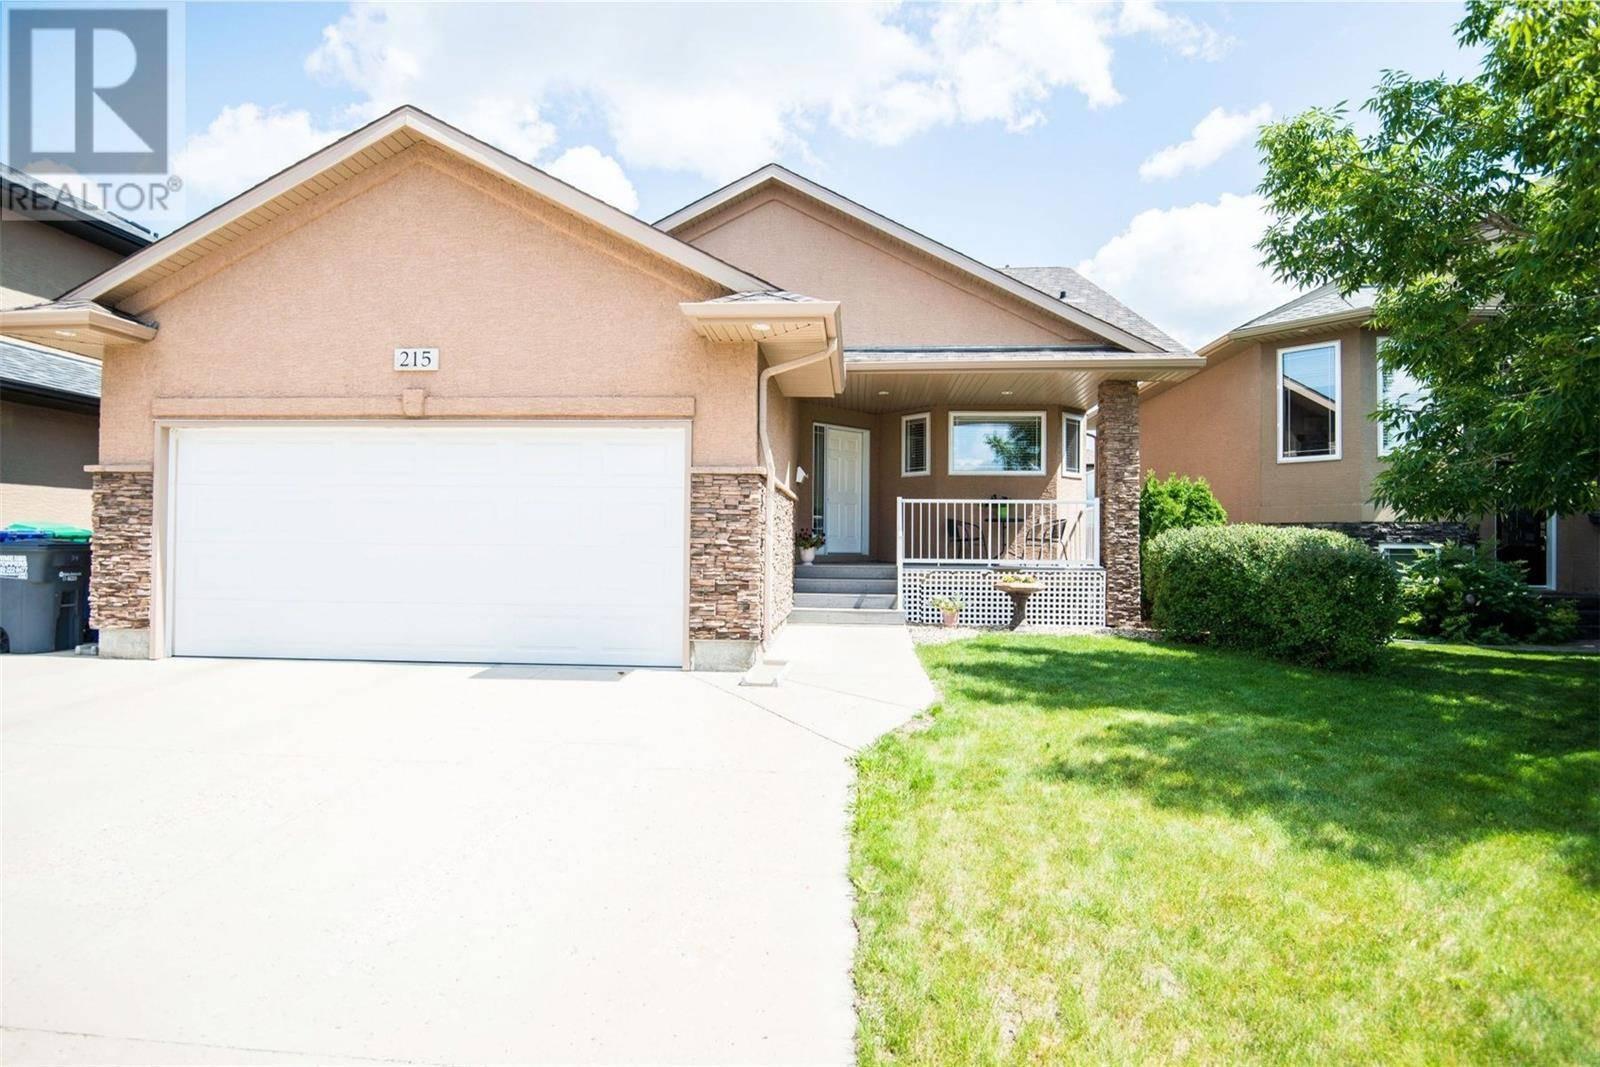 House for sale at 215 Fawcett Cres Saskatoon Saskatchewan - MLS: SK783335